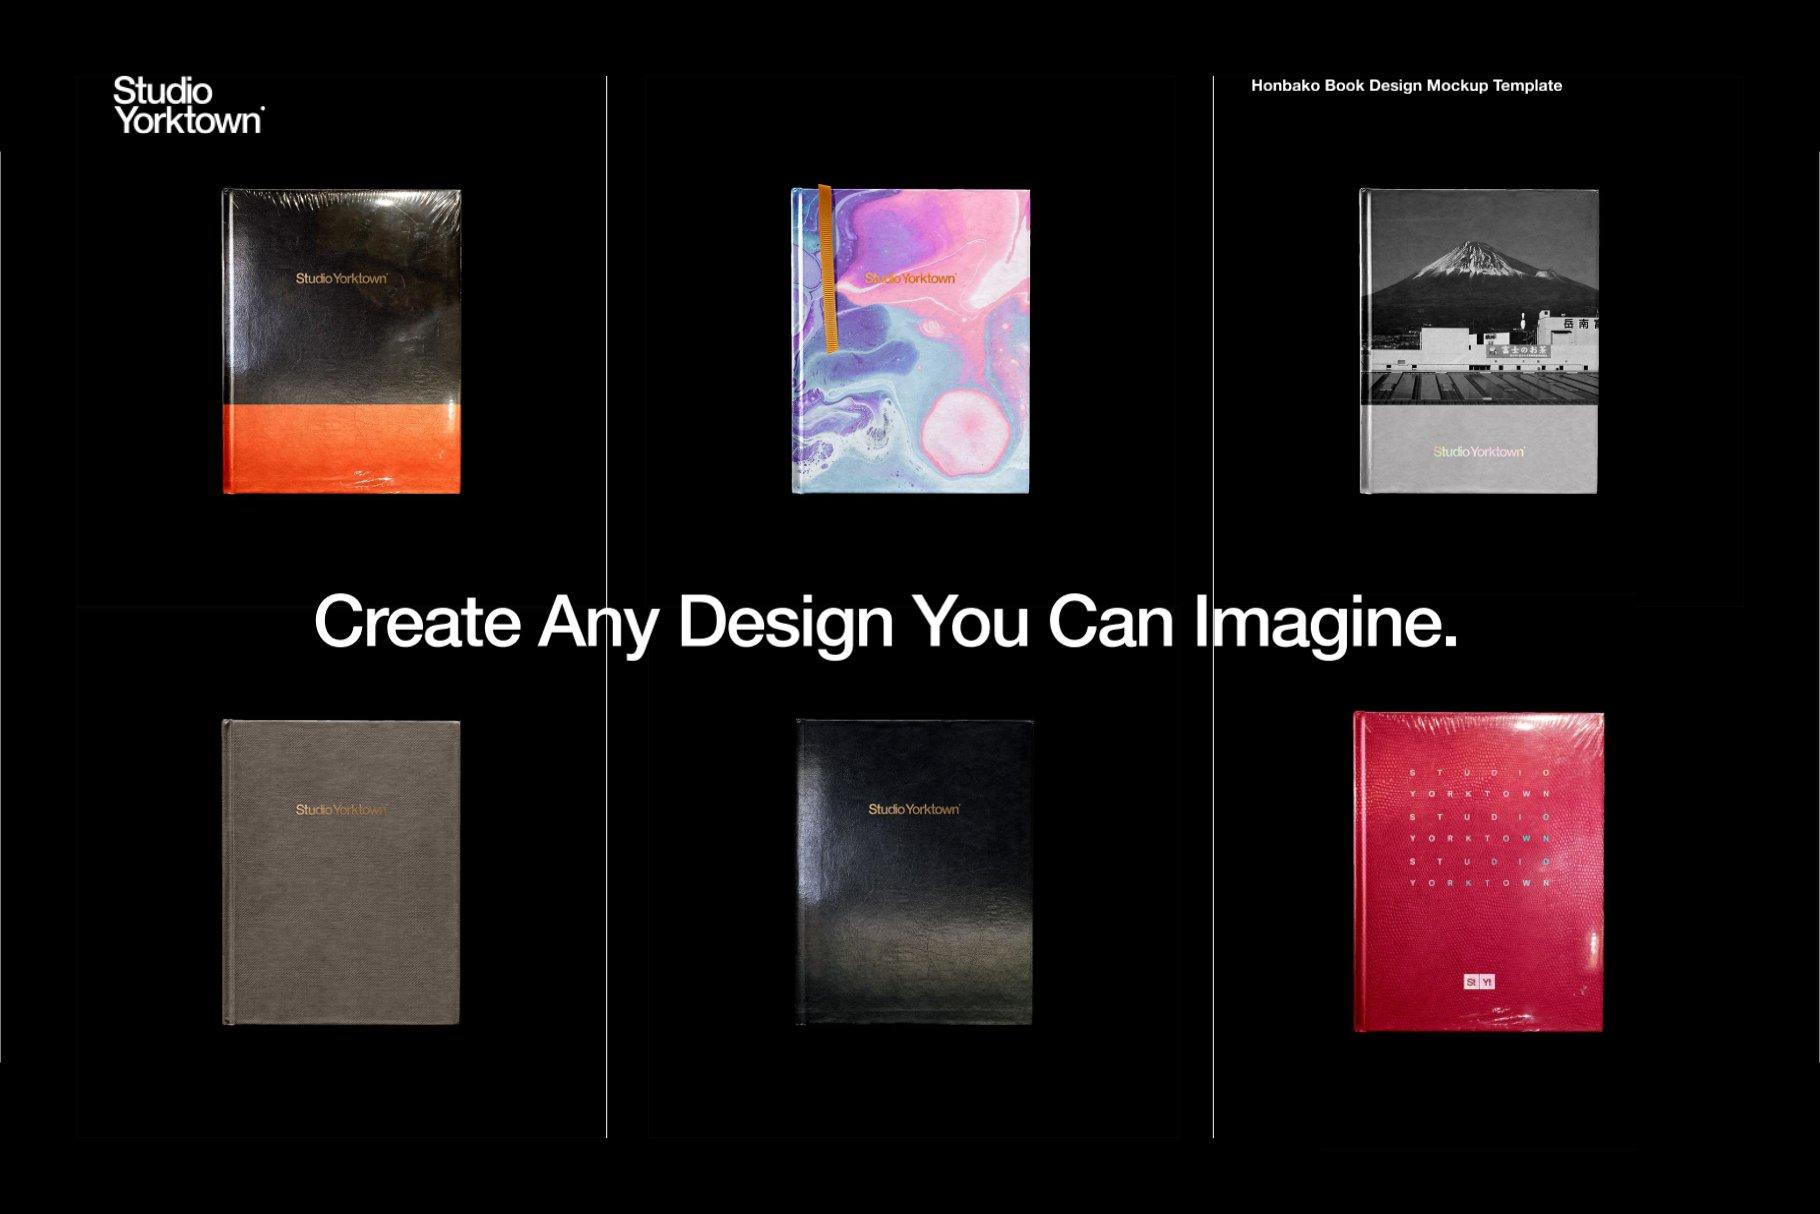 Honbako 逼真全息箔页面卷曲书籍设计PSD样机模板(4329)插图(4)